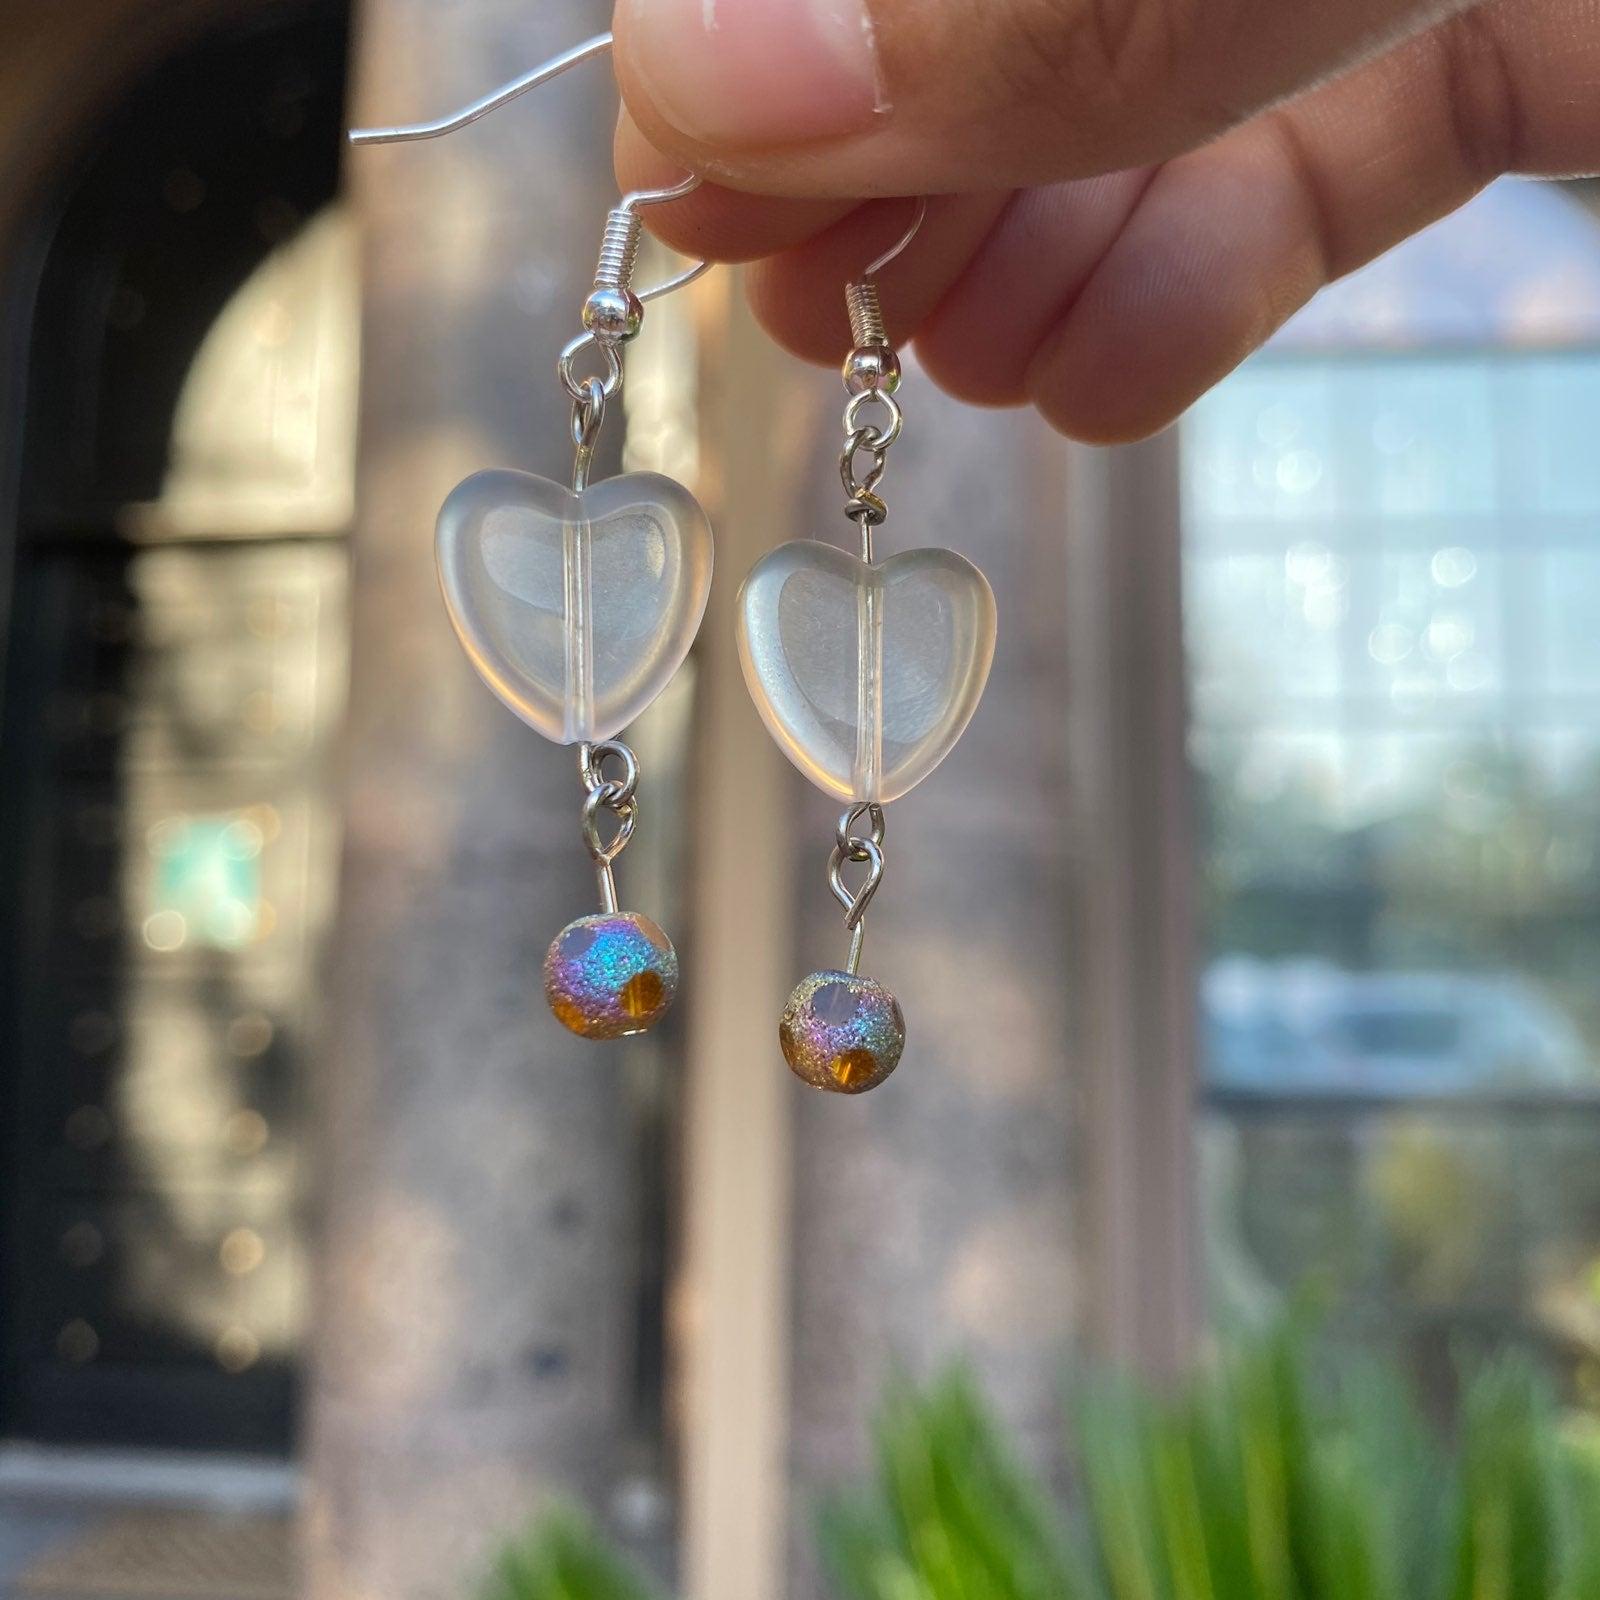 Handmade Dangly Earrings